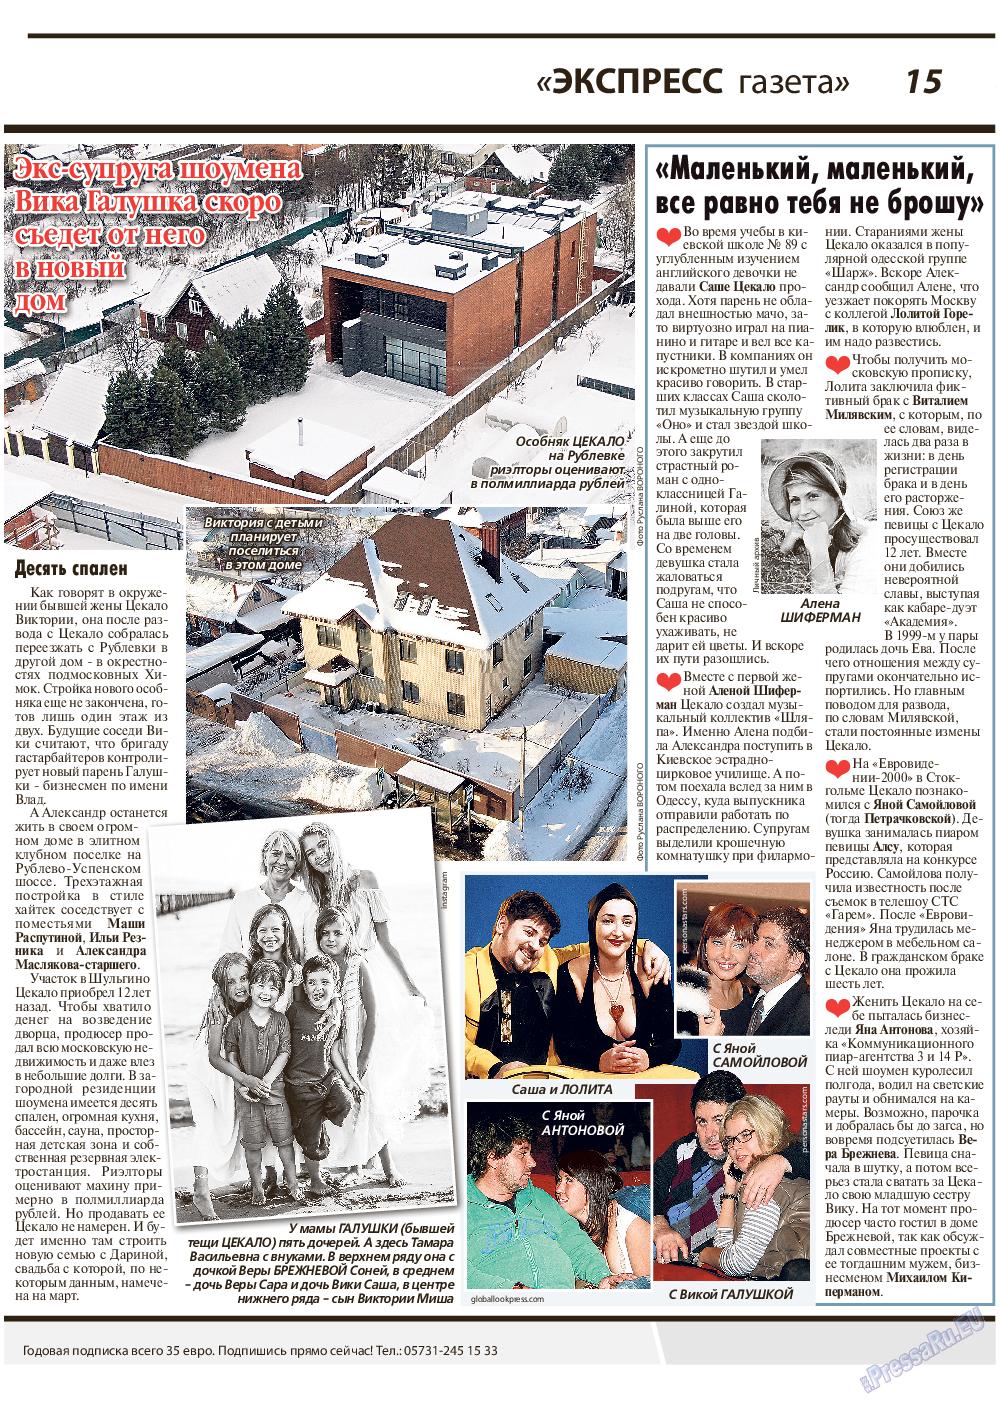 Экспресс газета (газета). 2019 год, номер 3, стр. 15